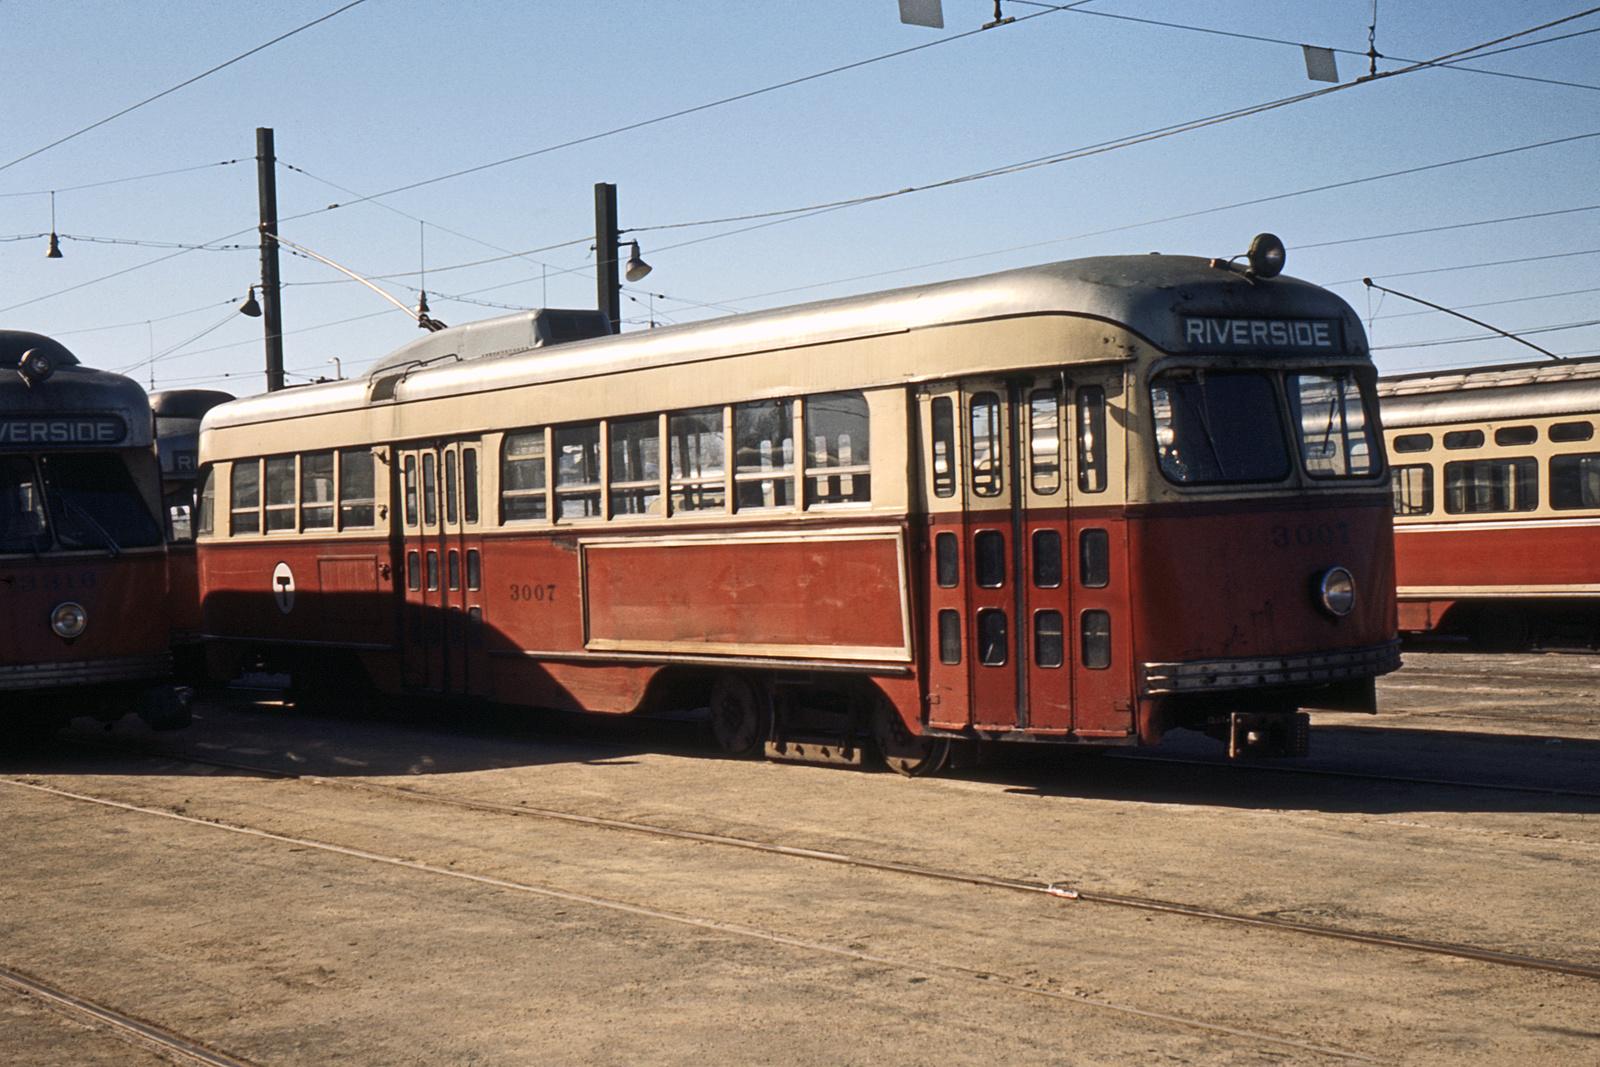 (339k, 1024x683)<br><b>Country:</b> United States<br><b>City:</b> Boston, MA<br><b>System:</b> MBTA<br><b>Line:</b> MBTA Green (D)<br><b>Location:</b> Riverside Yard <br><b>Car:</b> MBTA/BSRy PCC Tremont (Pullman-Standard, 1941)  3007 <br><b>Photo by:</b> Ed Davis, Sr.<br><b>Collection of:</b> David Pirmann<br><b>Date:</b> 2/1966<br><b>Viewed (this week/total):</b> 0 / 1275